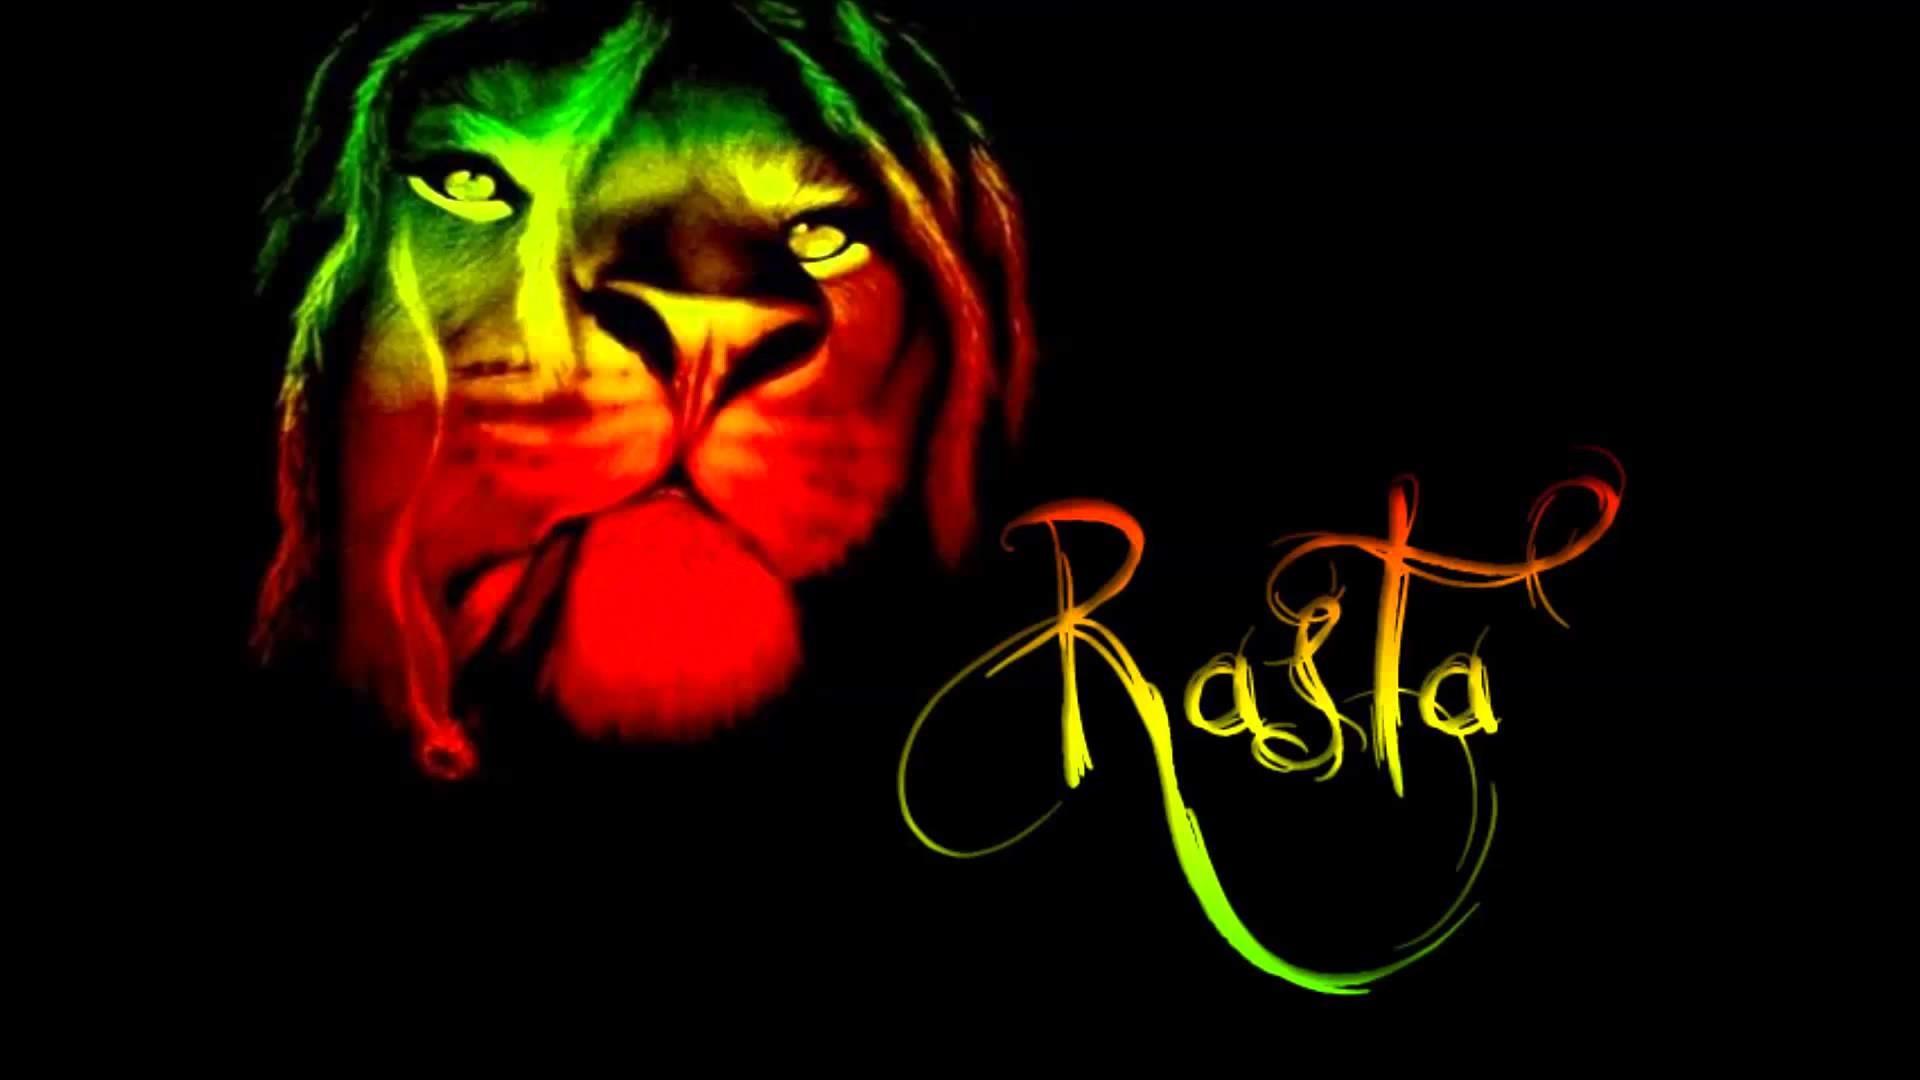 Rasta Lion Wallpaper Iphone Rastafarian Wallpapers 183 ①